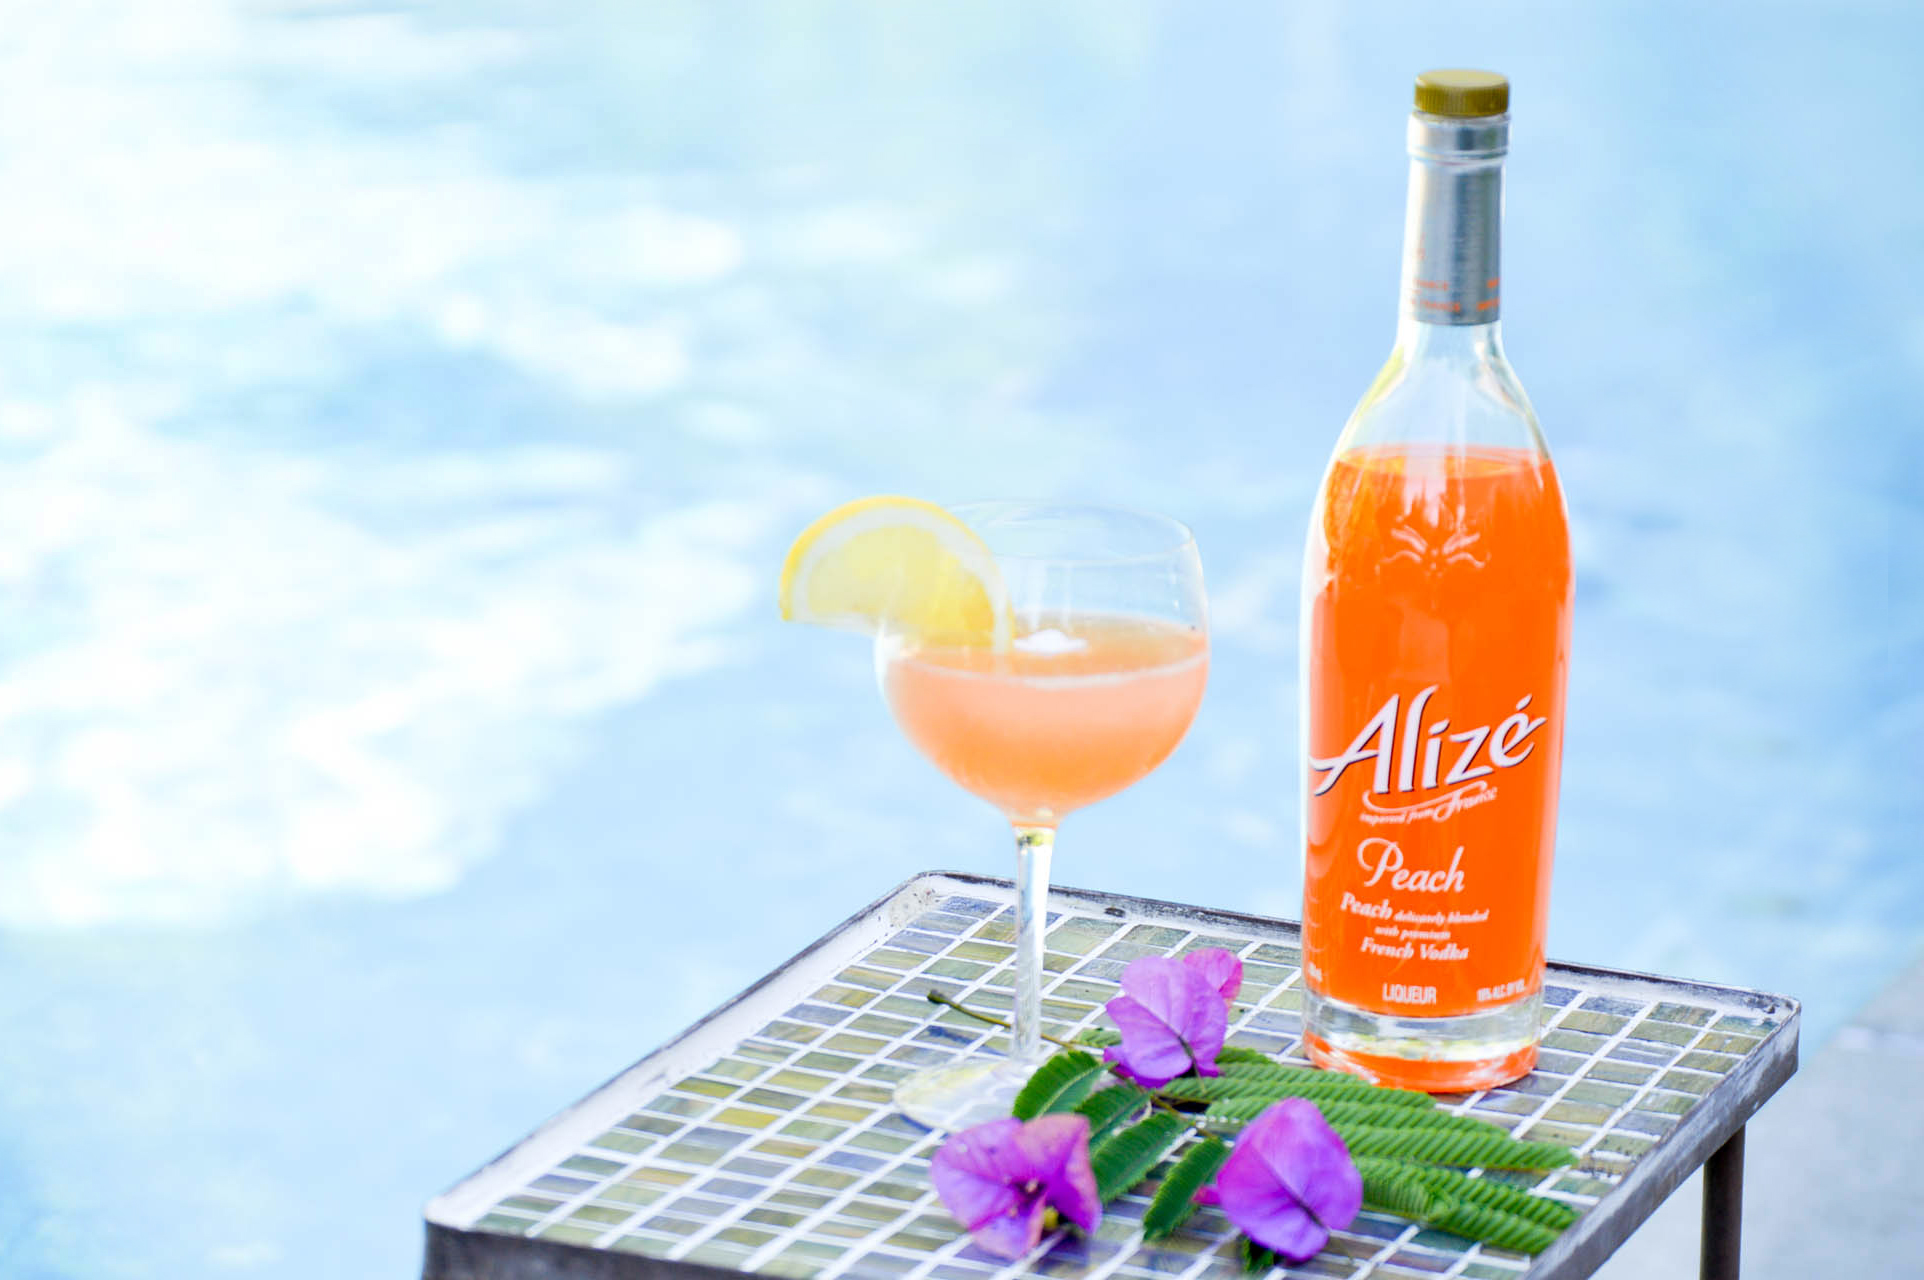 Peach Grapefruit fizz cocktail via. www.birdieshoots.com